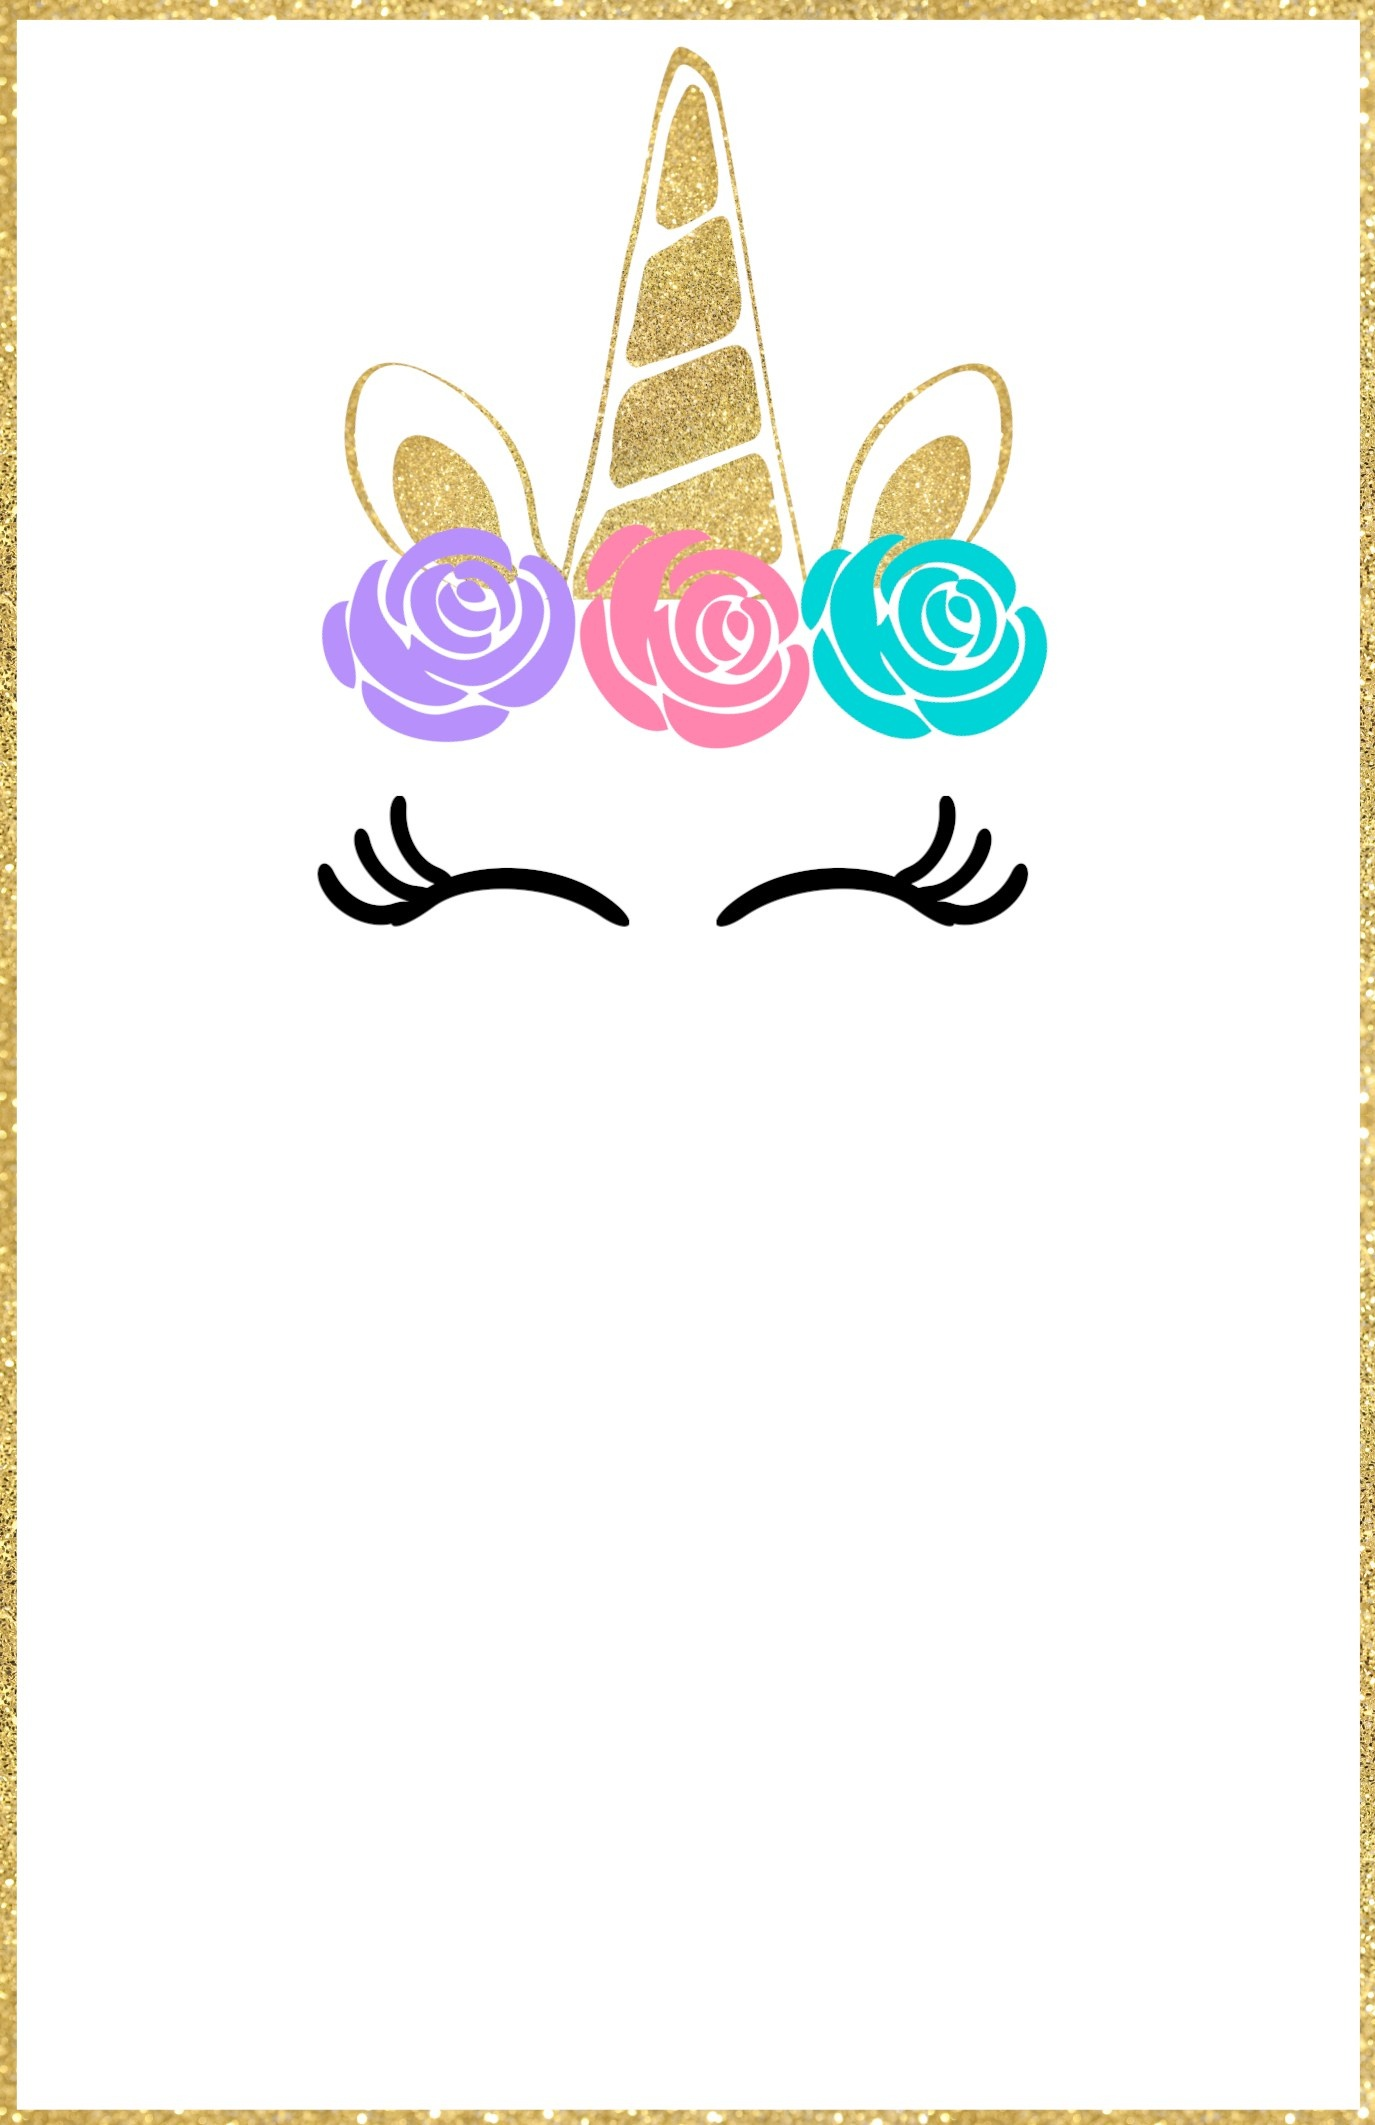 Free Printable Unicorn Invitations Template - Paper Trail Design - Free Printable Invitations Templates